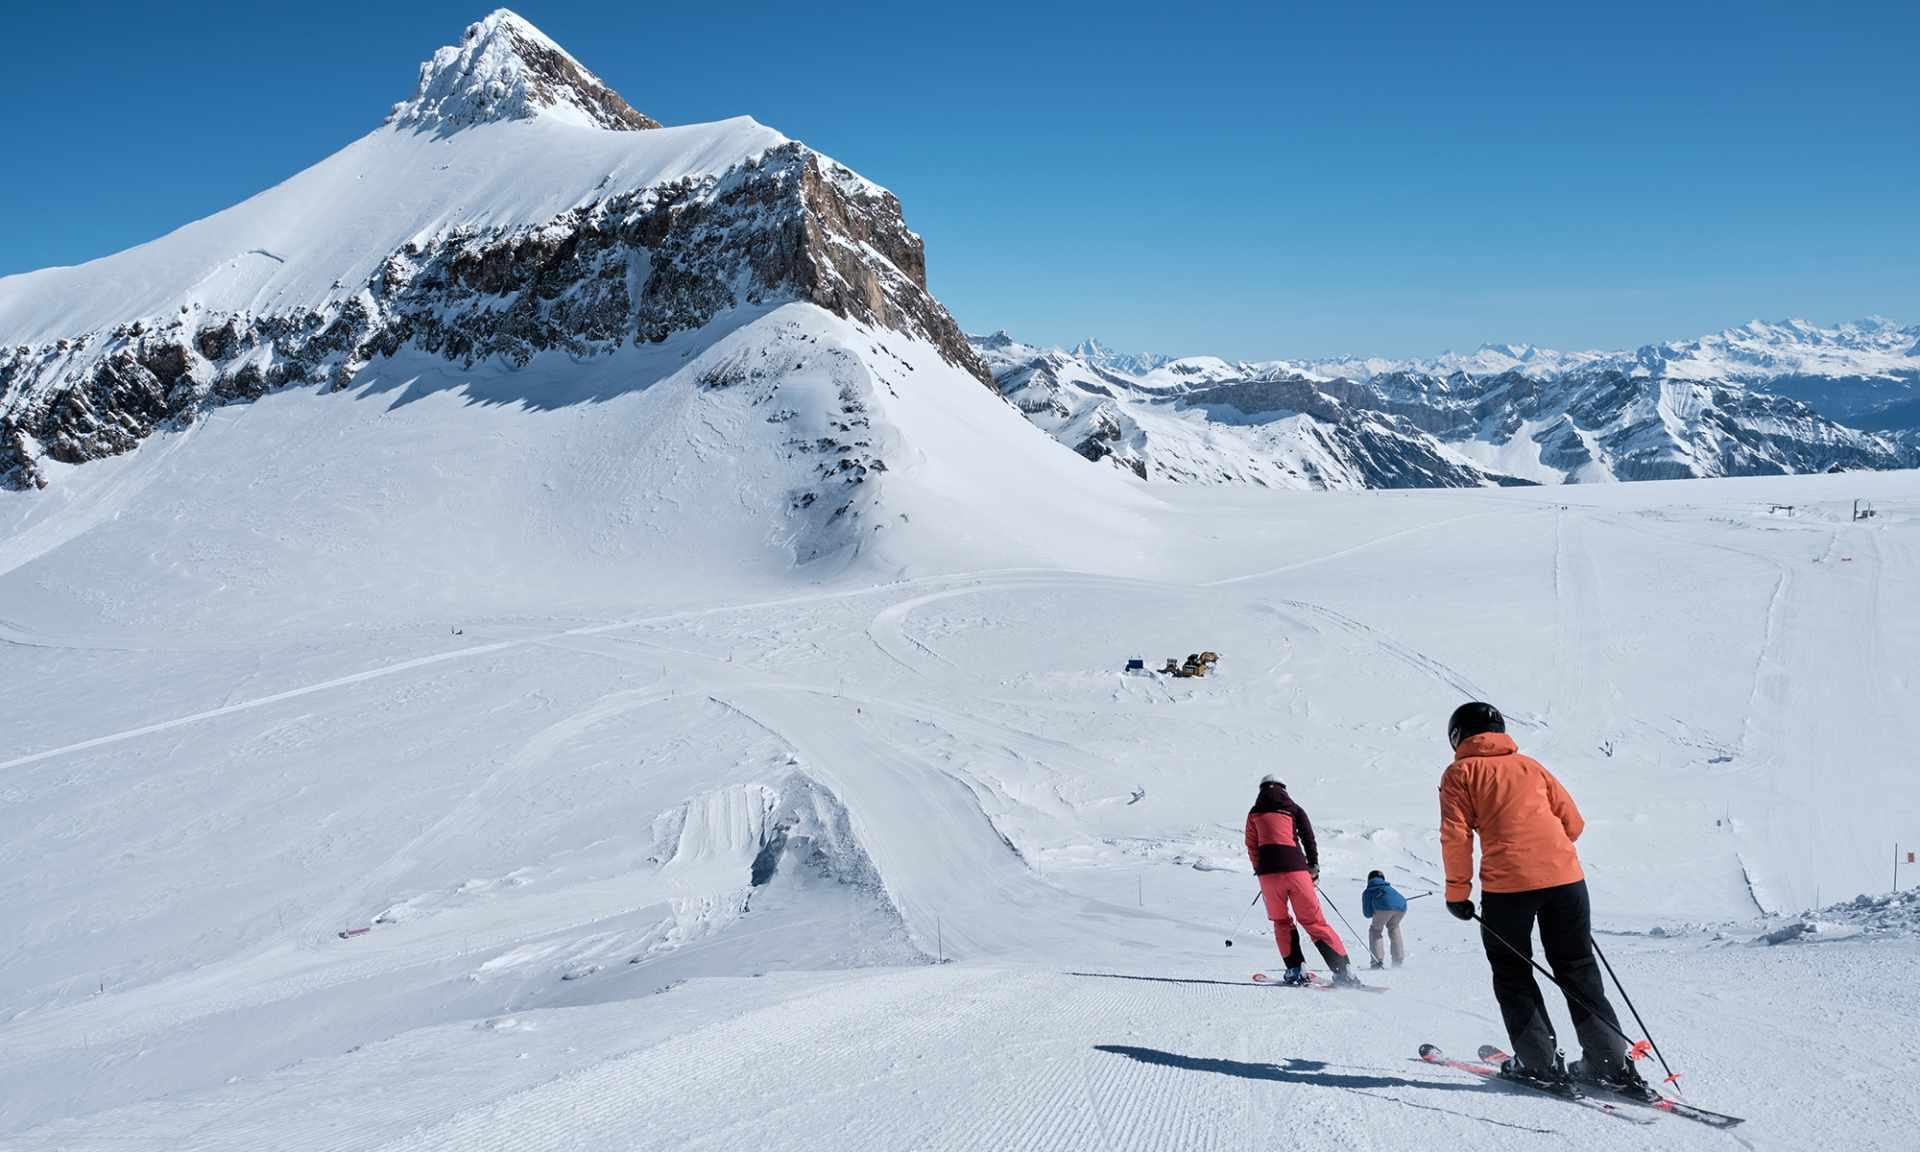 Ski on the Glacier 3000 facing the Becca d'Audon - Les Diablerets - Winter